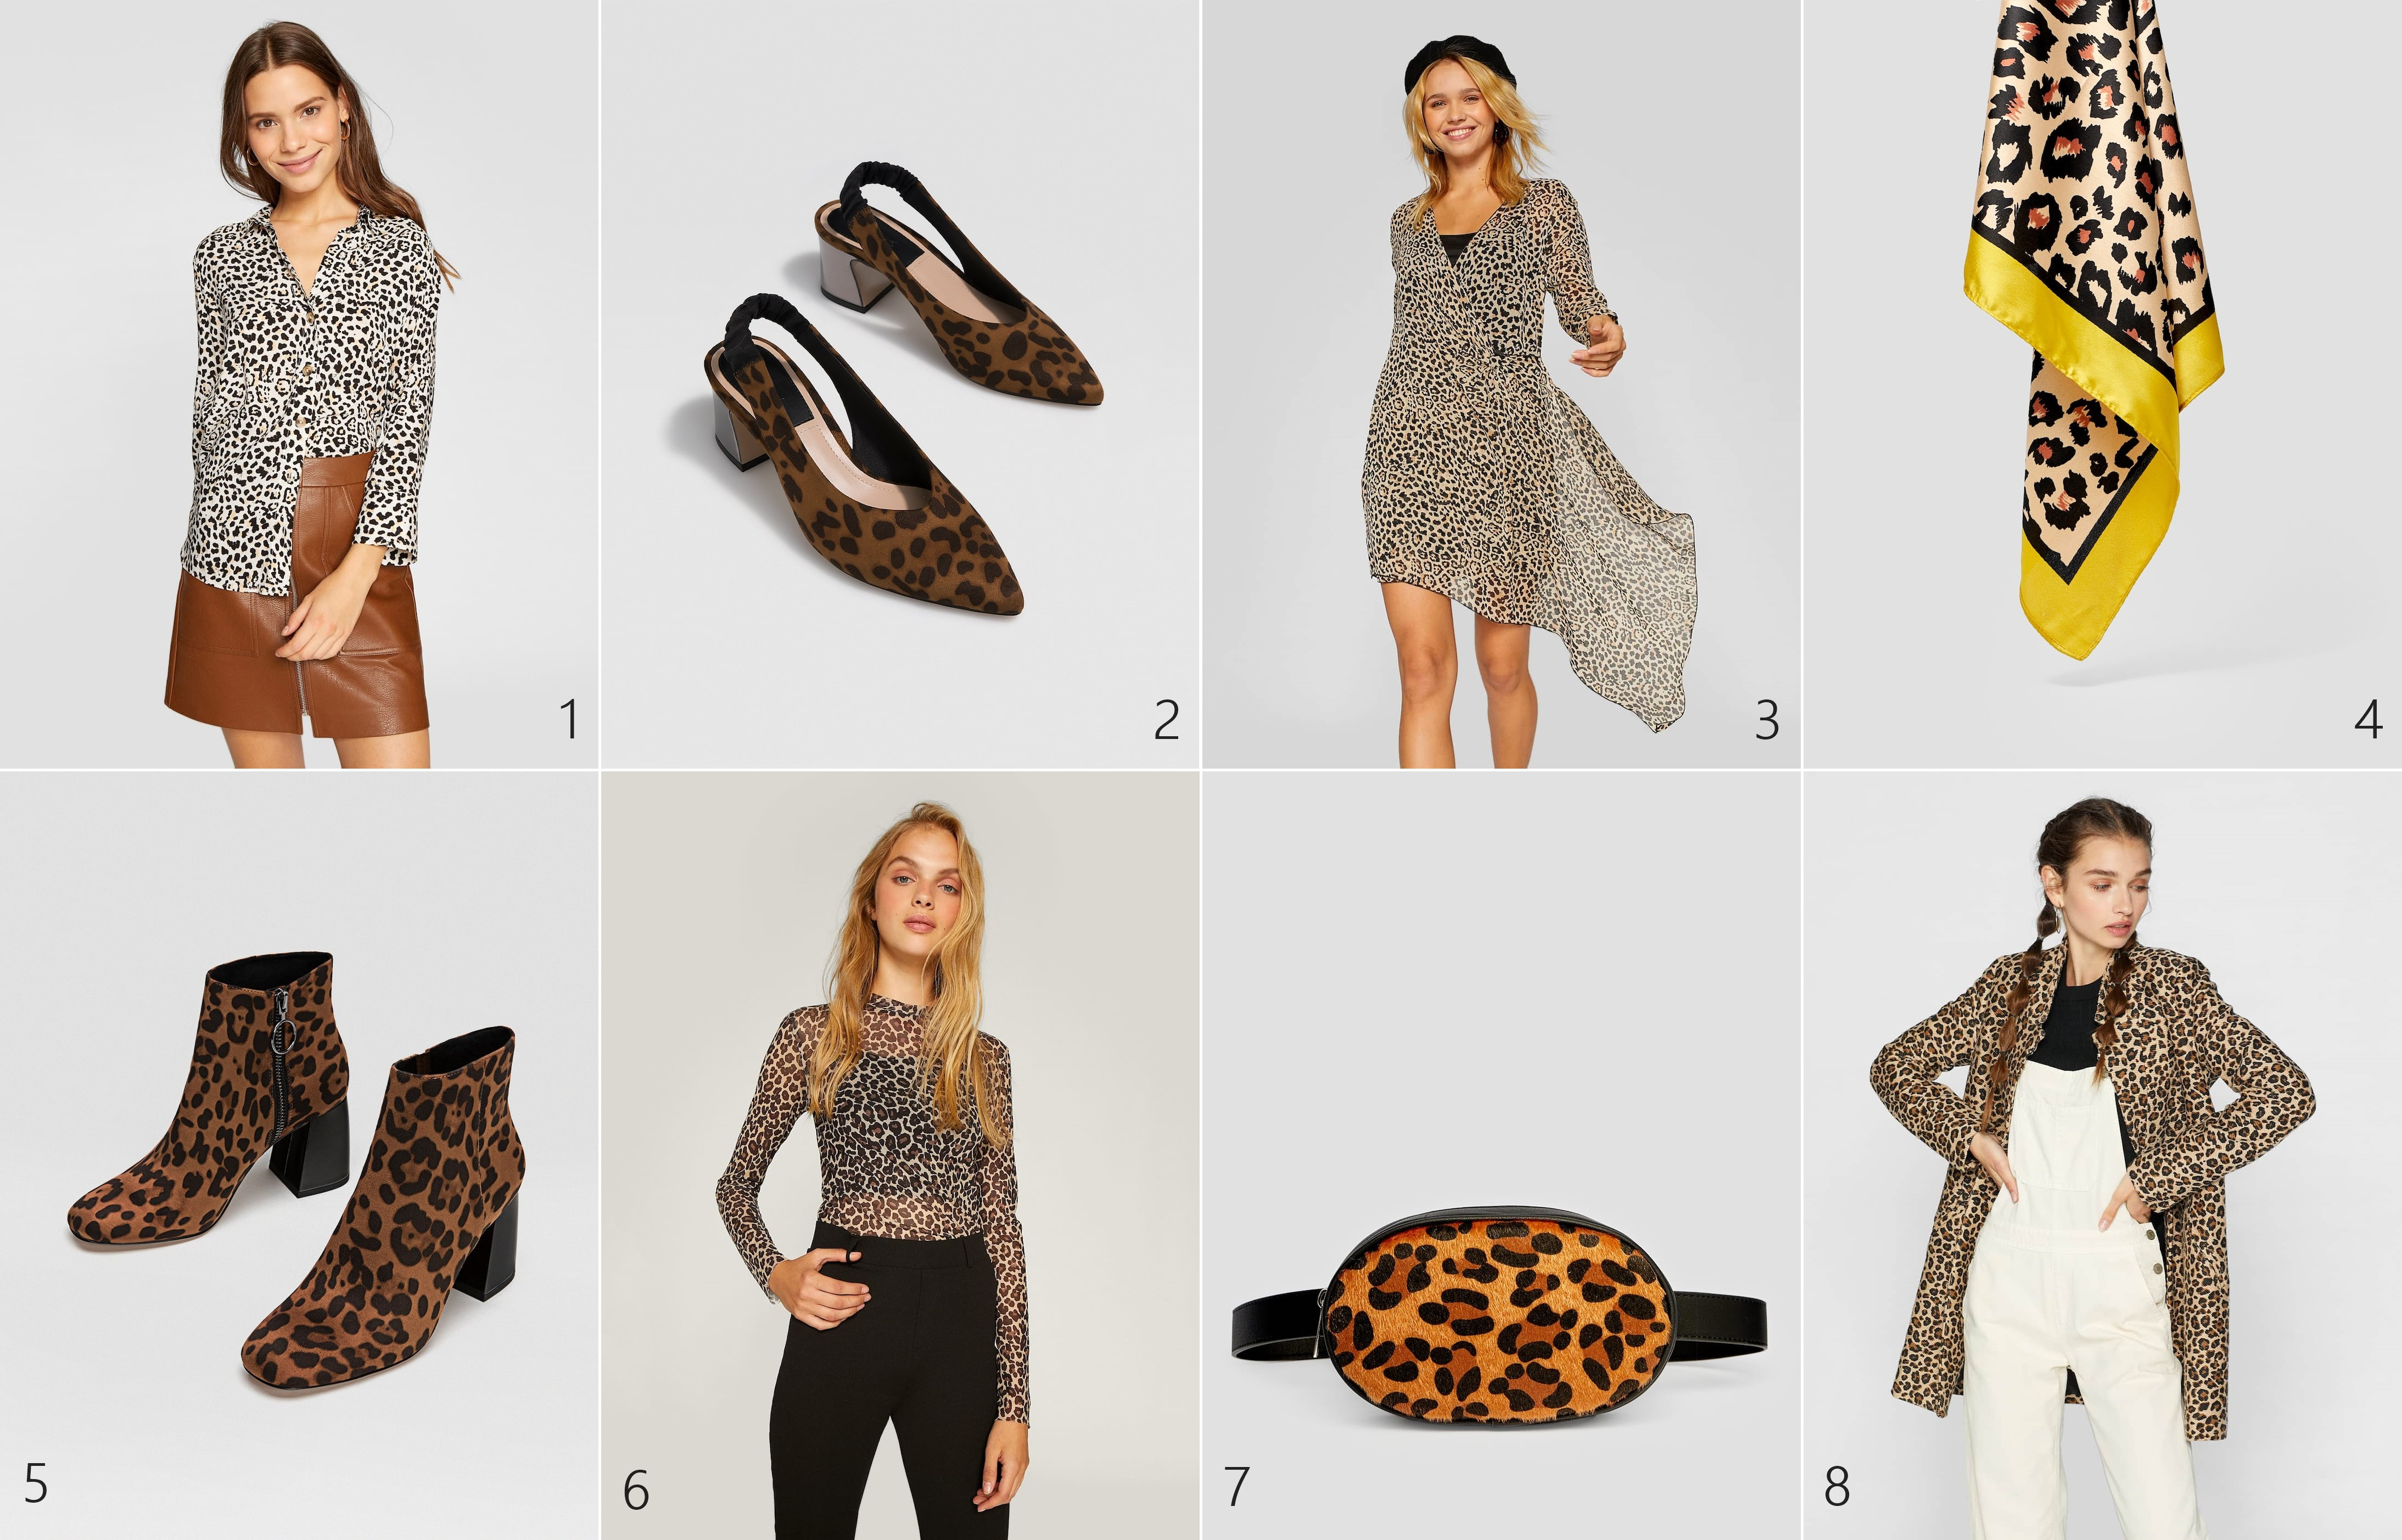 trend-alert-estampado-leopardo-stradivarius-01